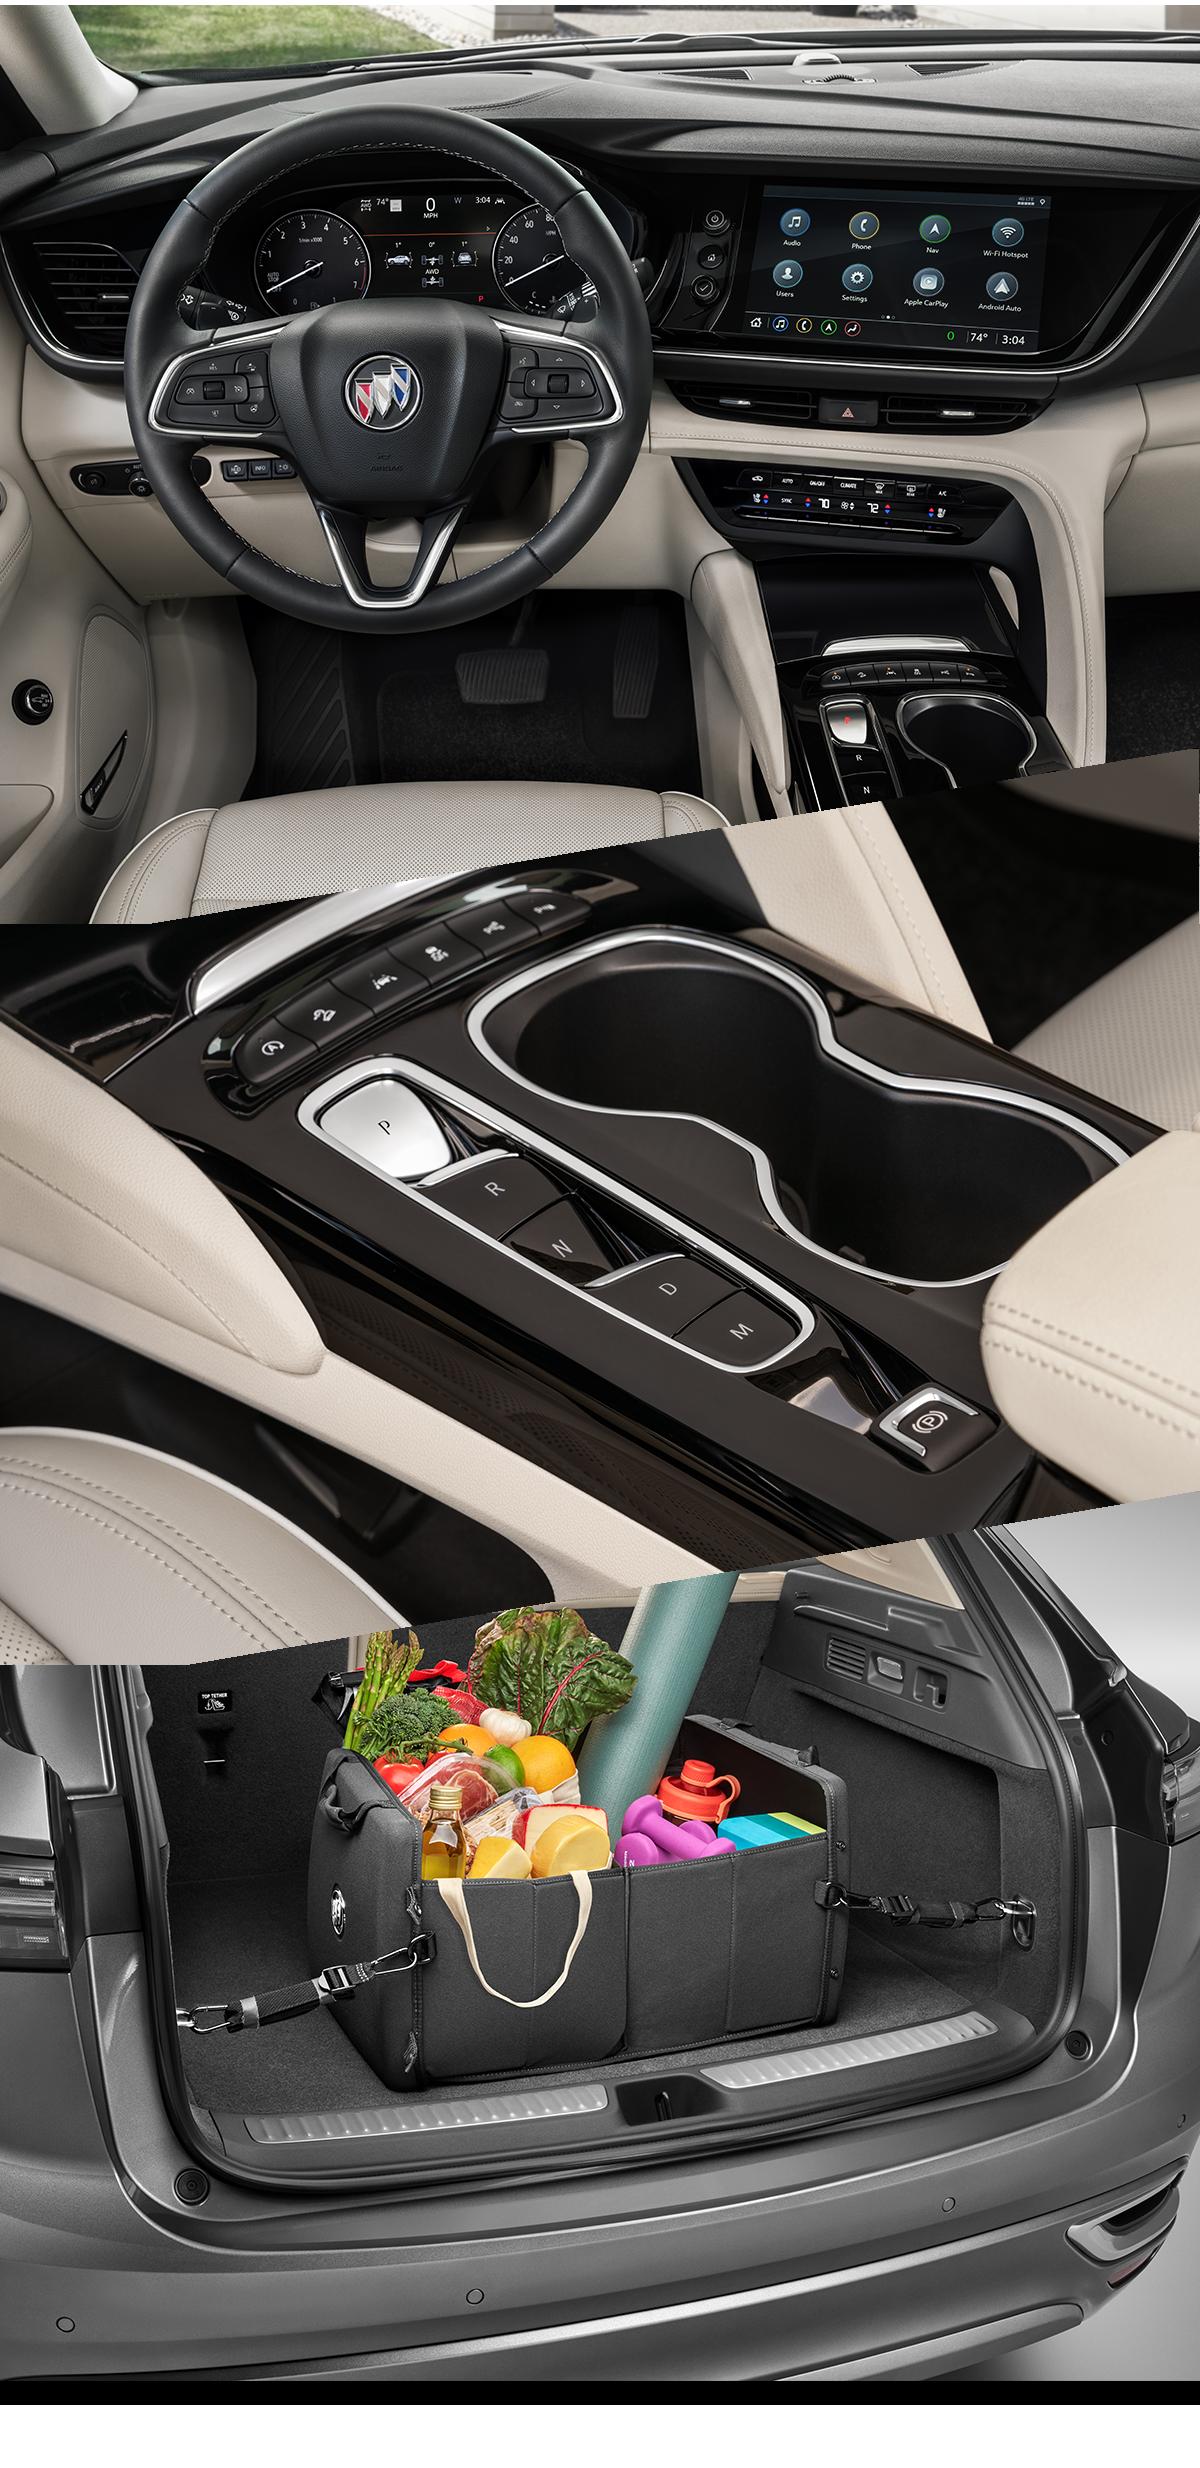 2021 Buick Envision Interior Images in Roanoke, VA